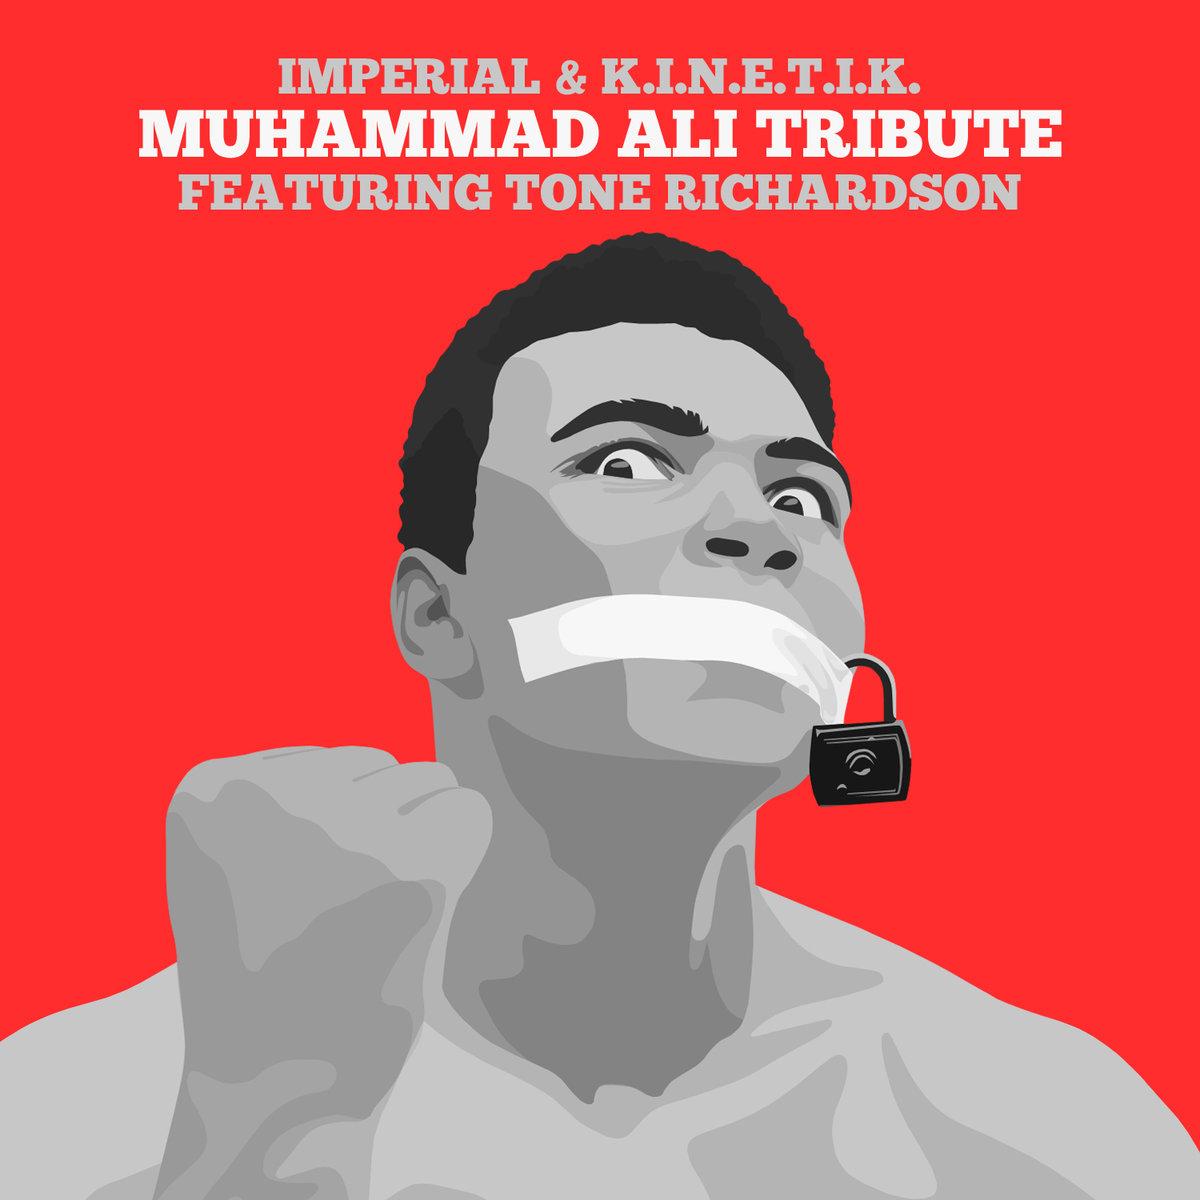 Muhammad_ali_tribute